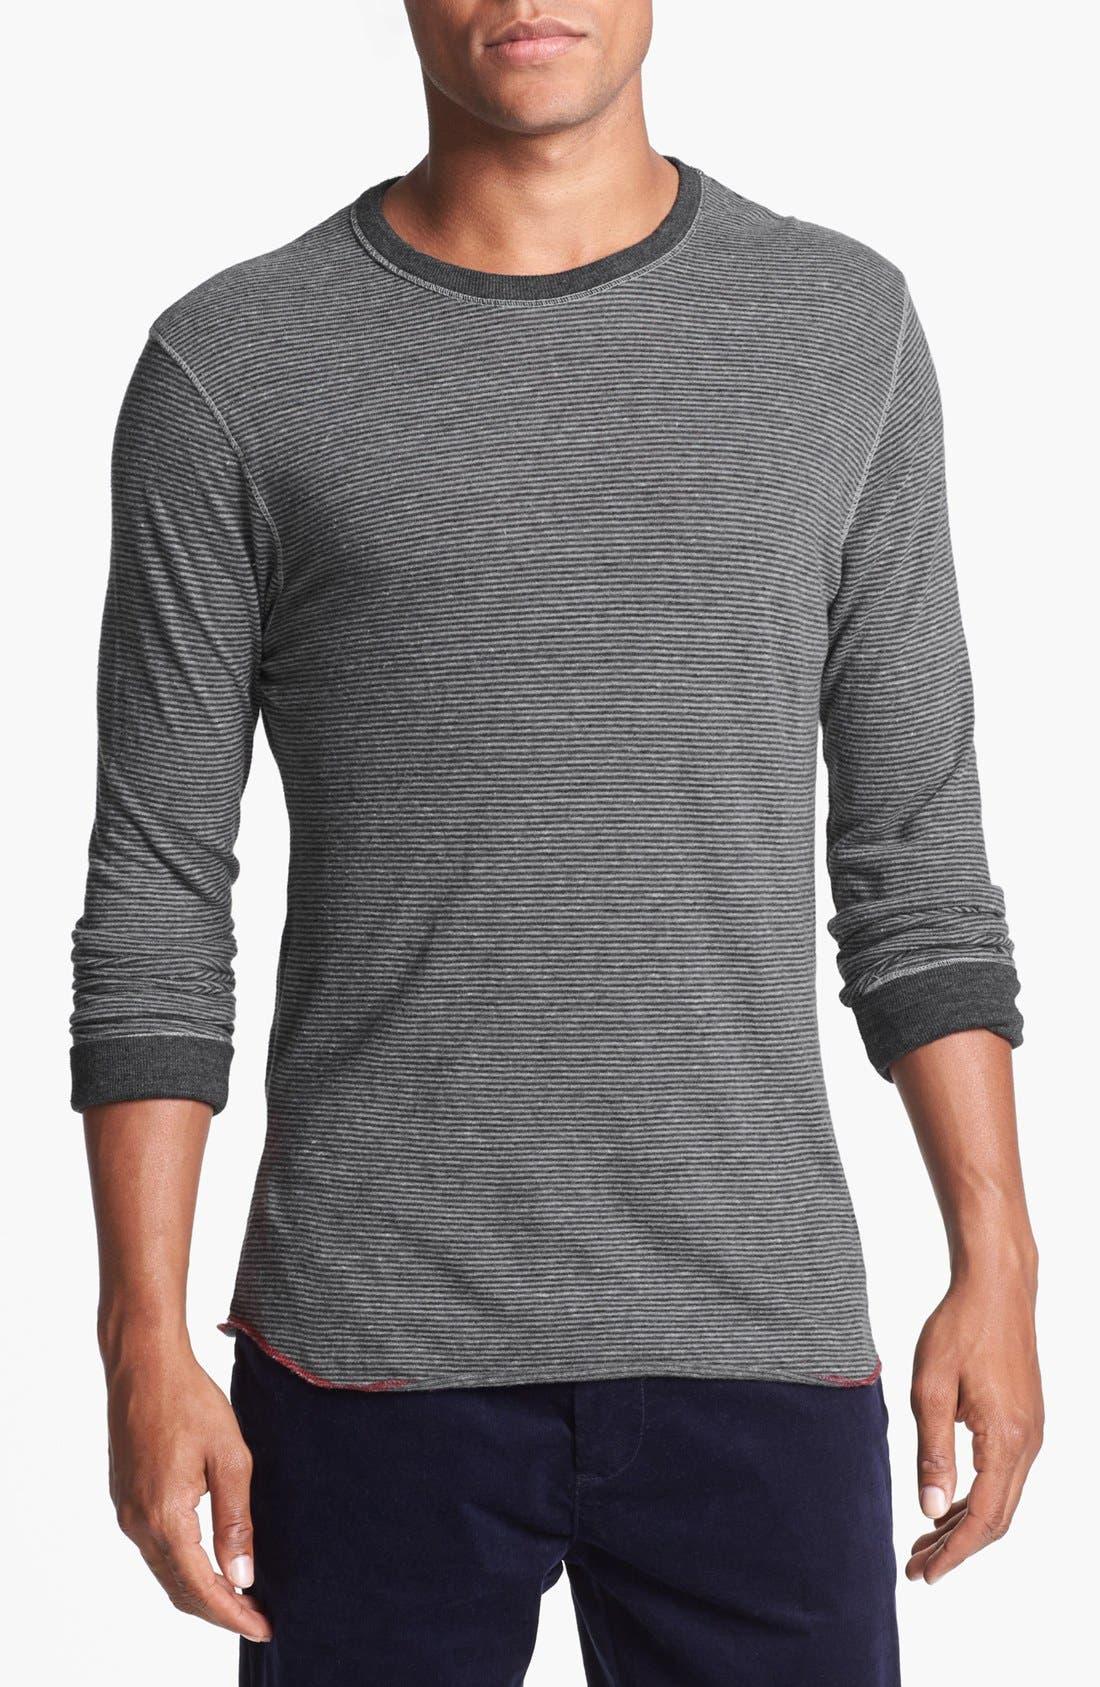 Alternate Image 1 Selected - Alternative 'Feeder' Stripe Long Sleeve Crewneck T-Shirt